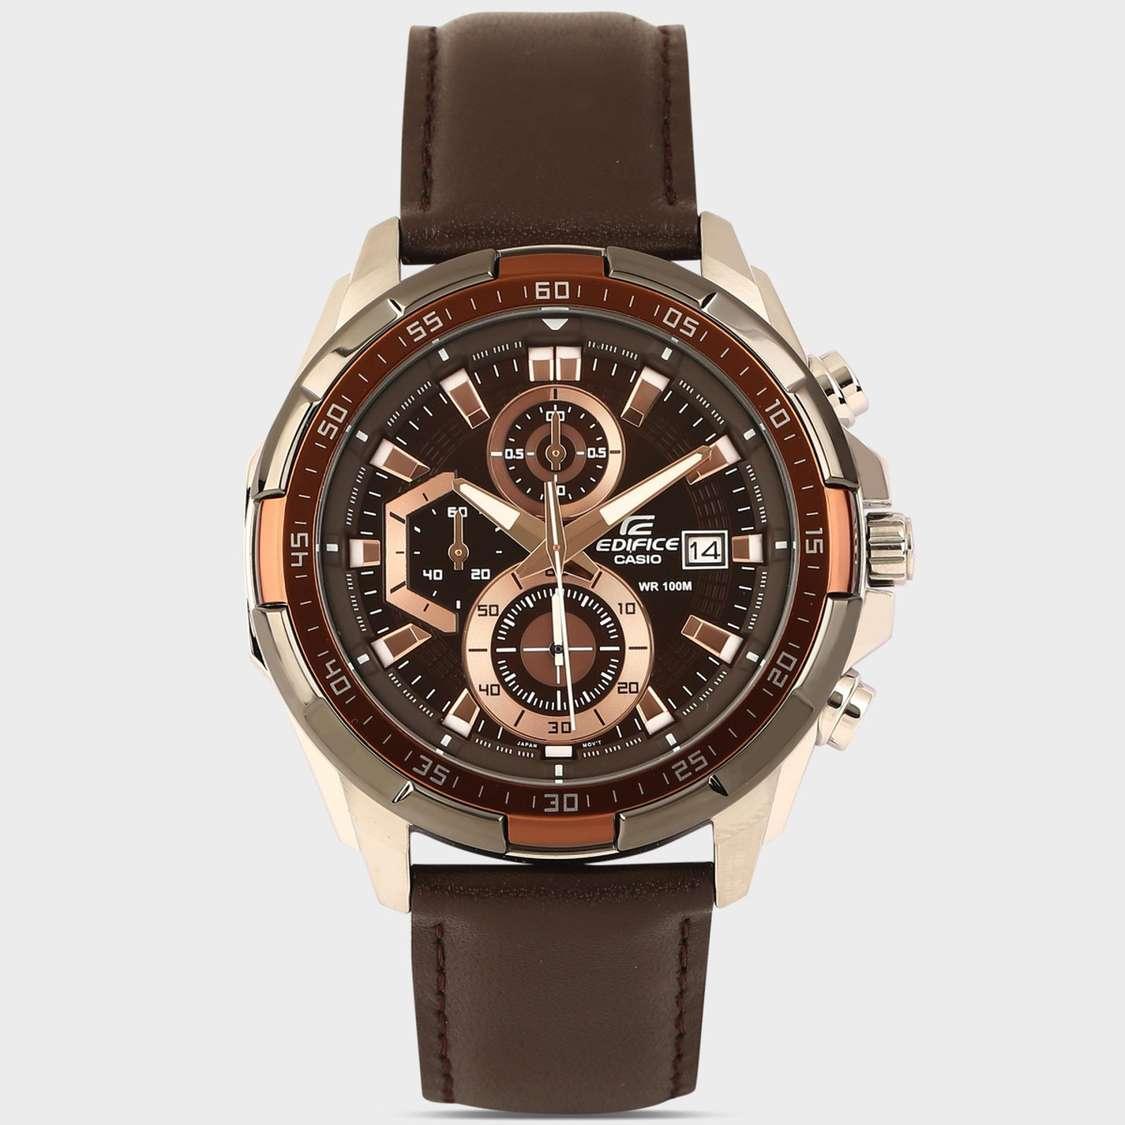 CASIO Edifice Analog Watch EX194